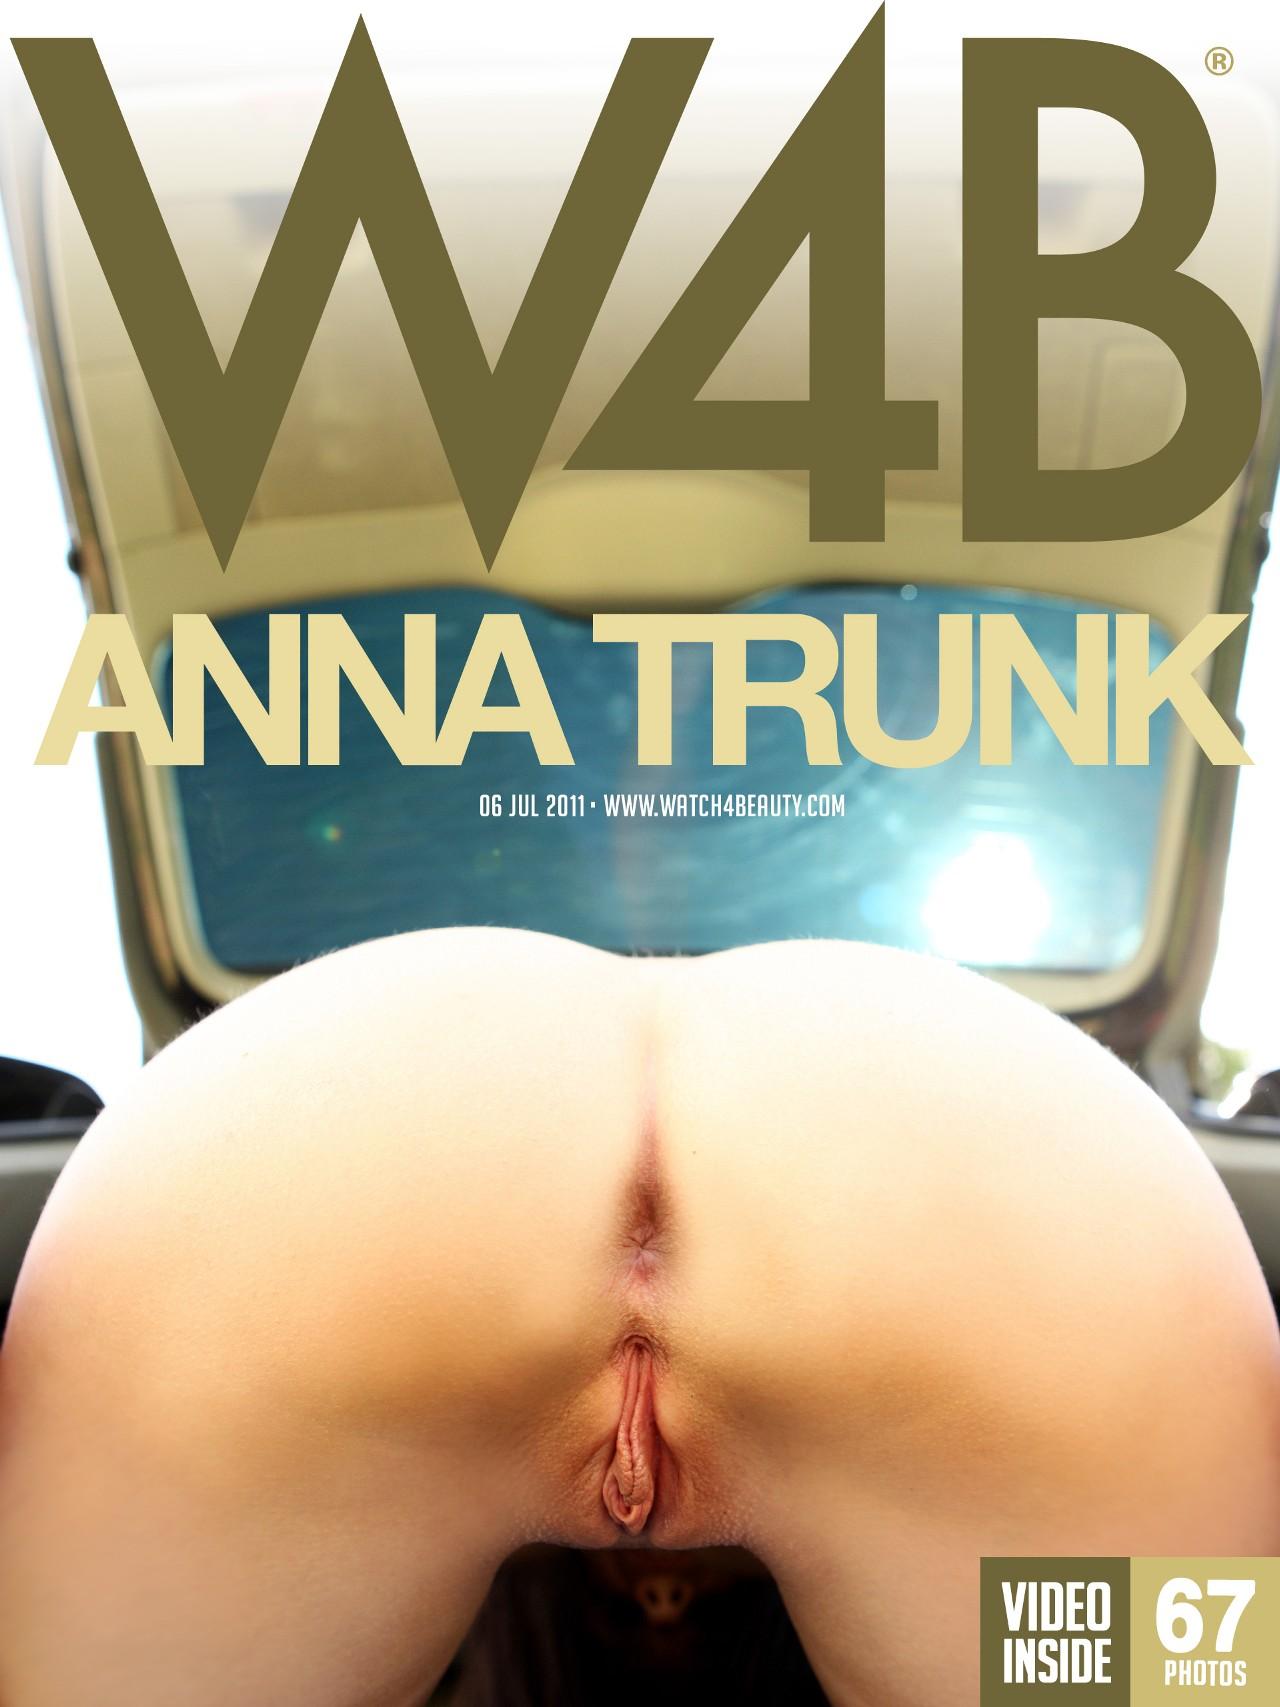 Anna: Trunk